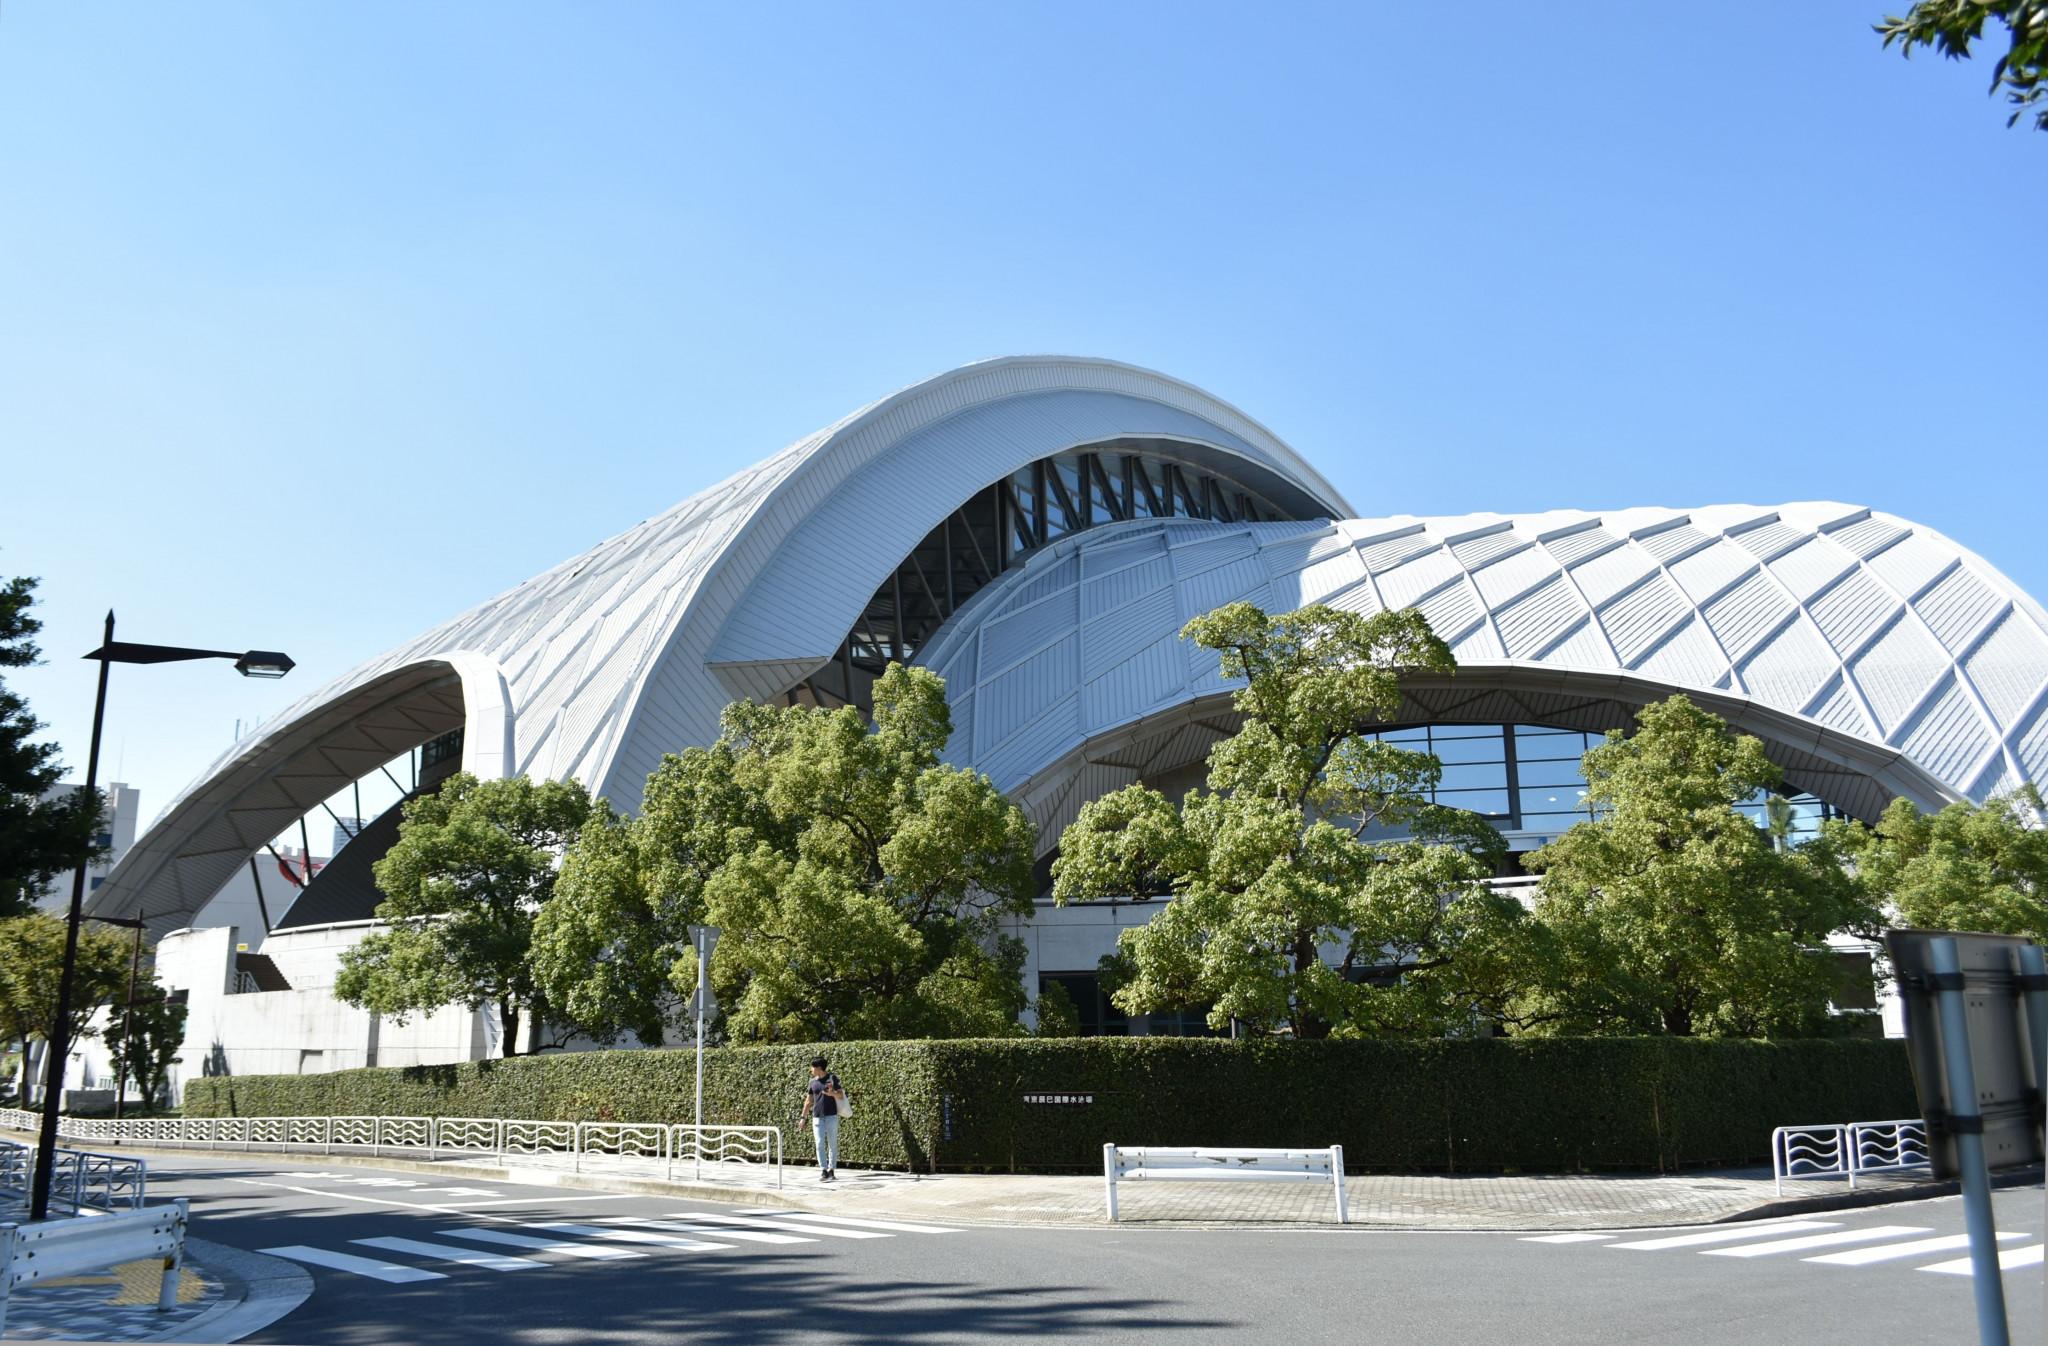 Urgent measures to be taken against asbestos at Tokyo 2020 venue